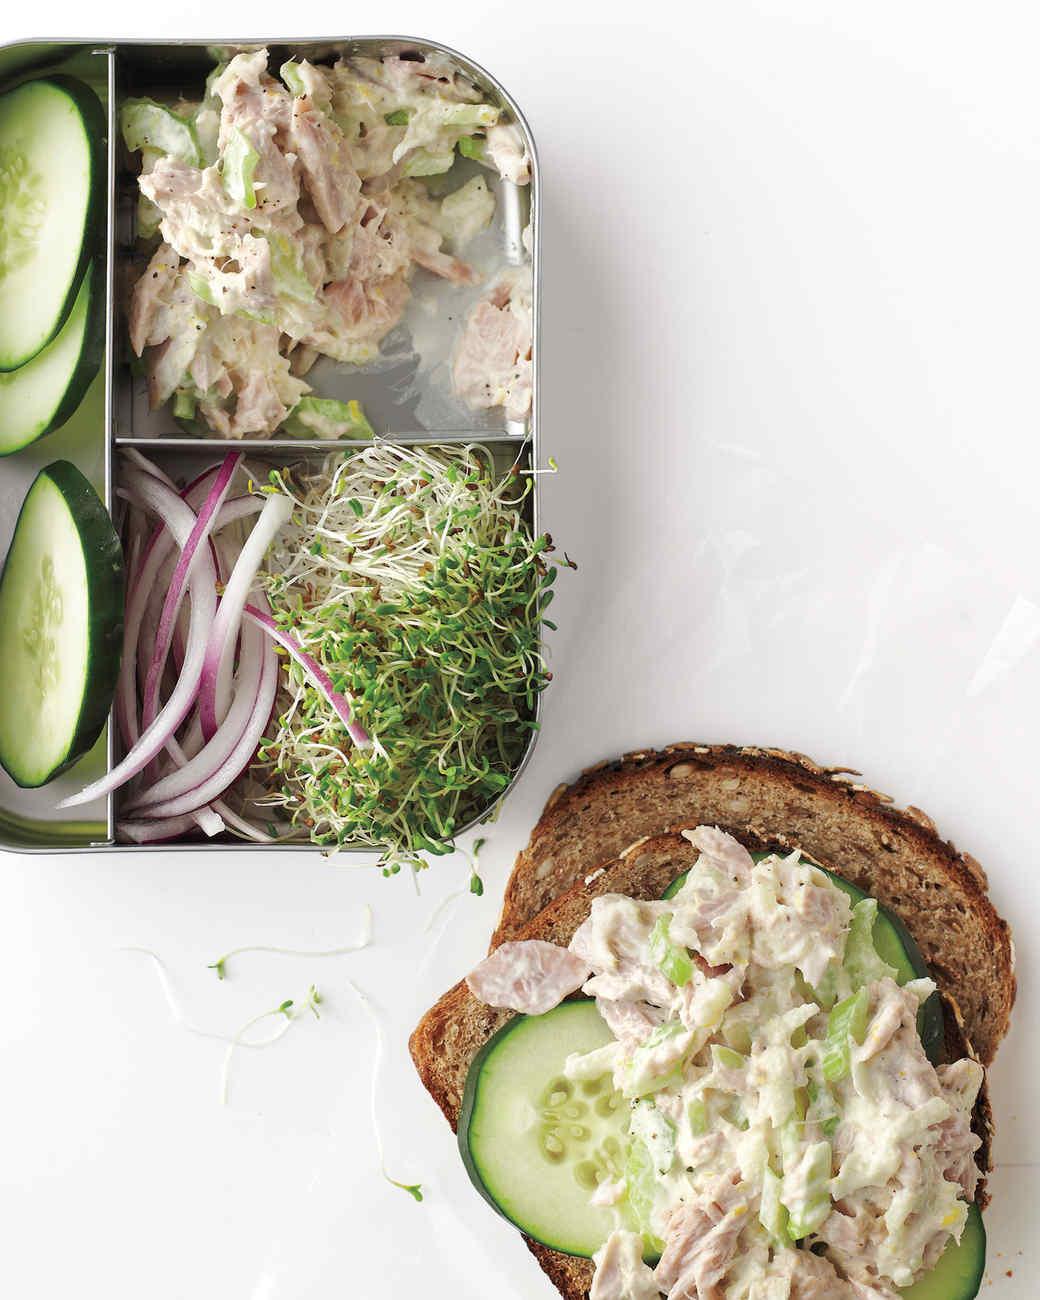 Tangy Tuna Salad